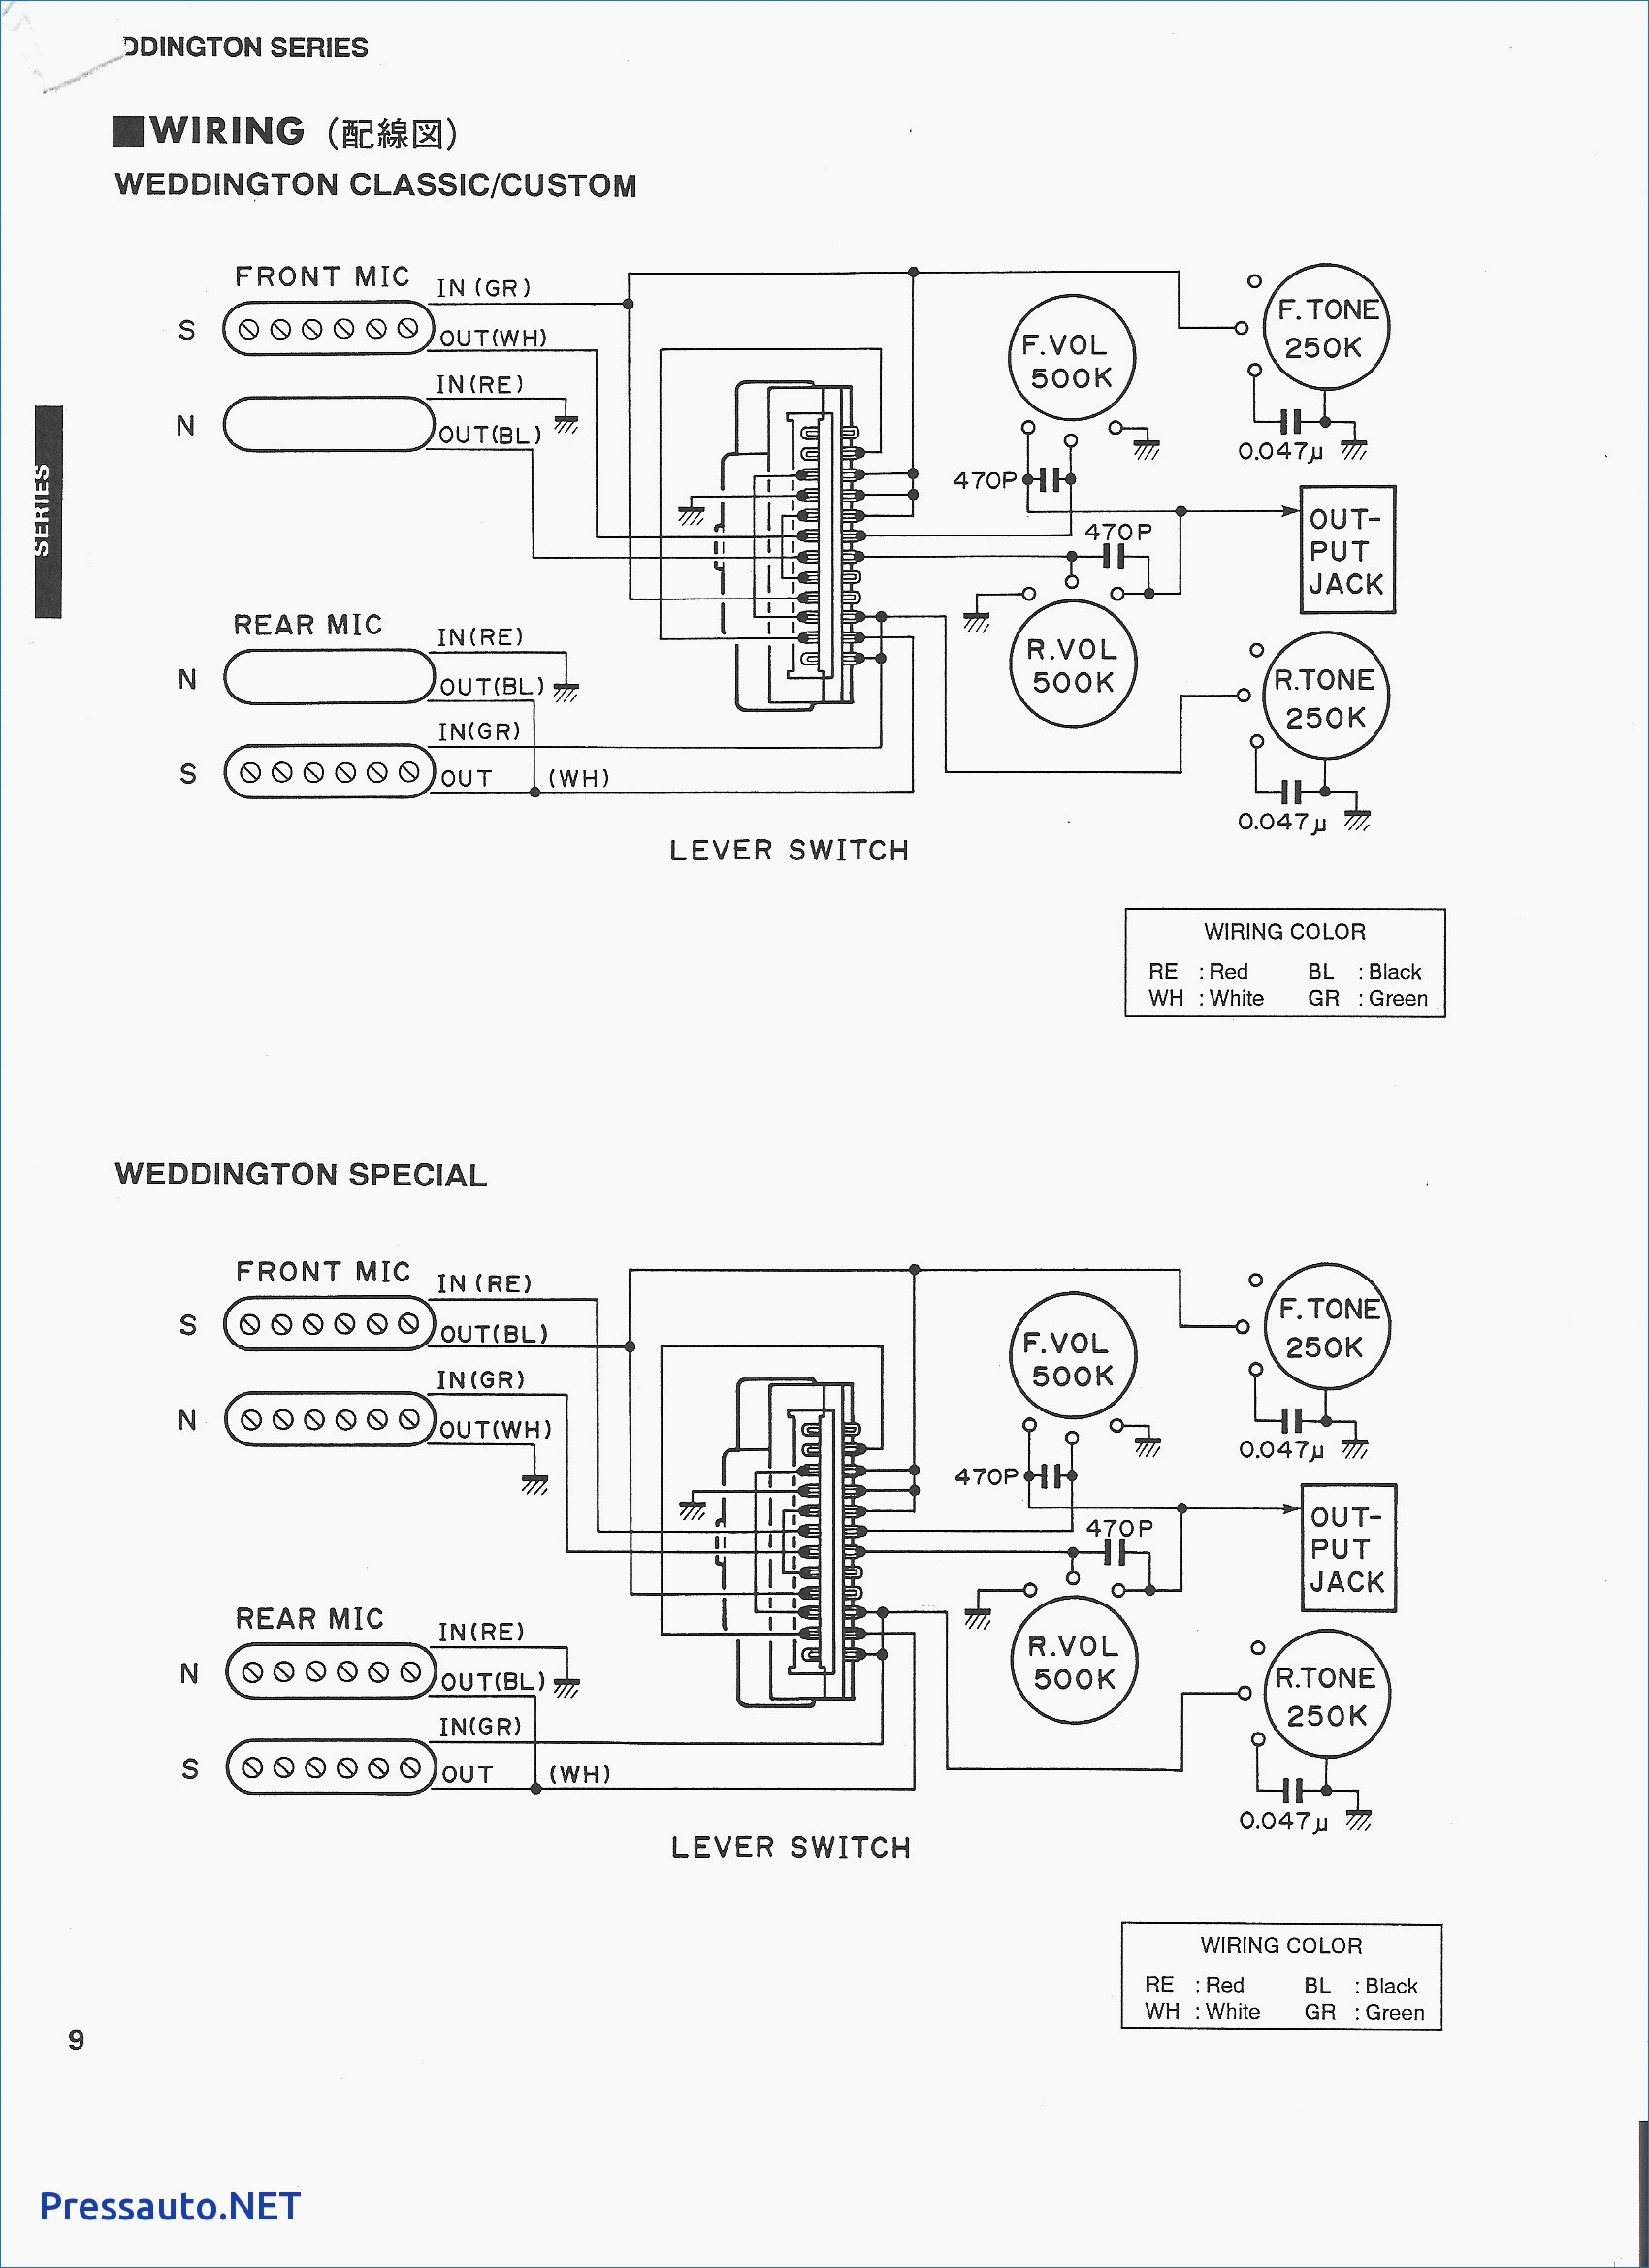 Ottawa On Wiring Diagram Pumptrol 9013 Wiring Diagram Begeboy Wiring Diagram Source